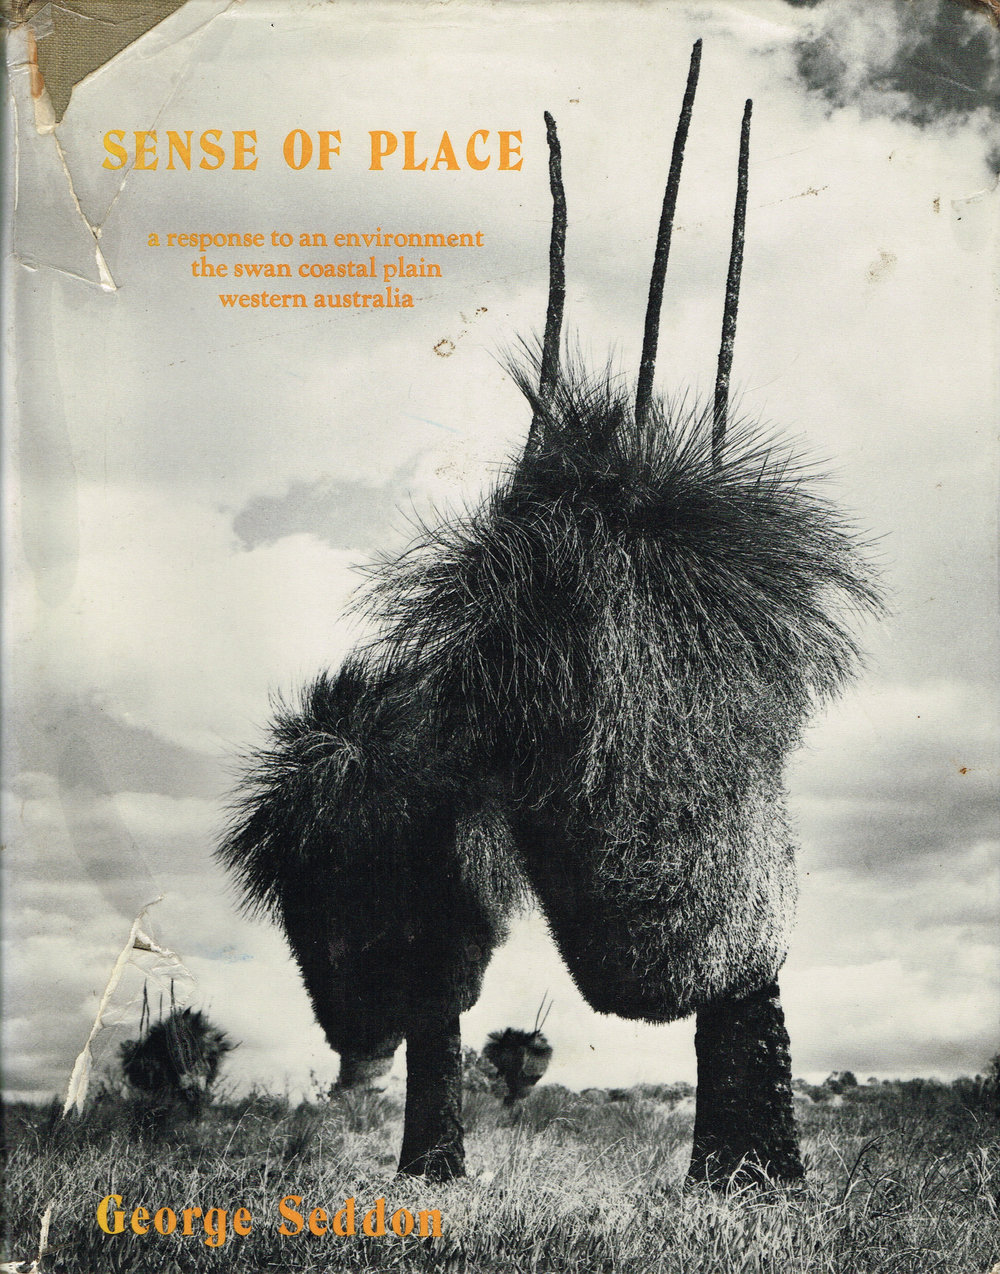 Sense_of_Place.jpg